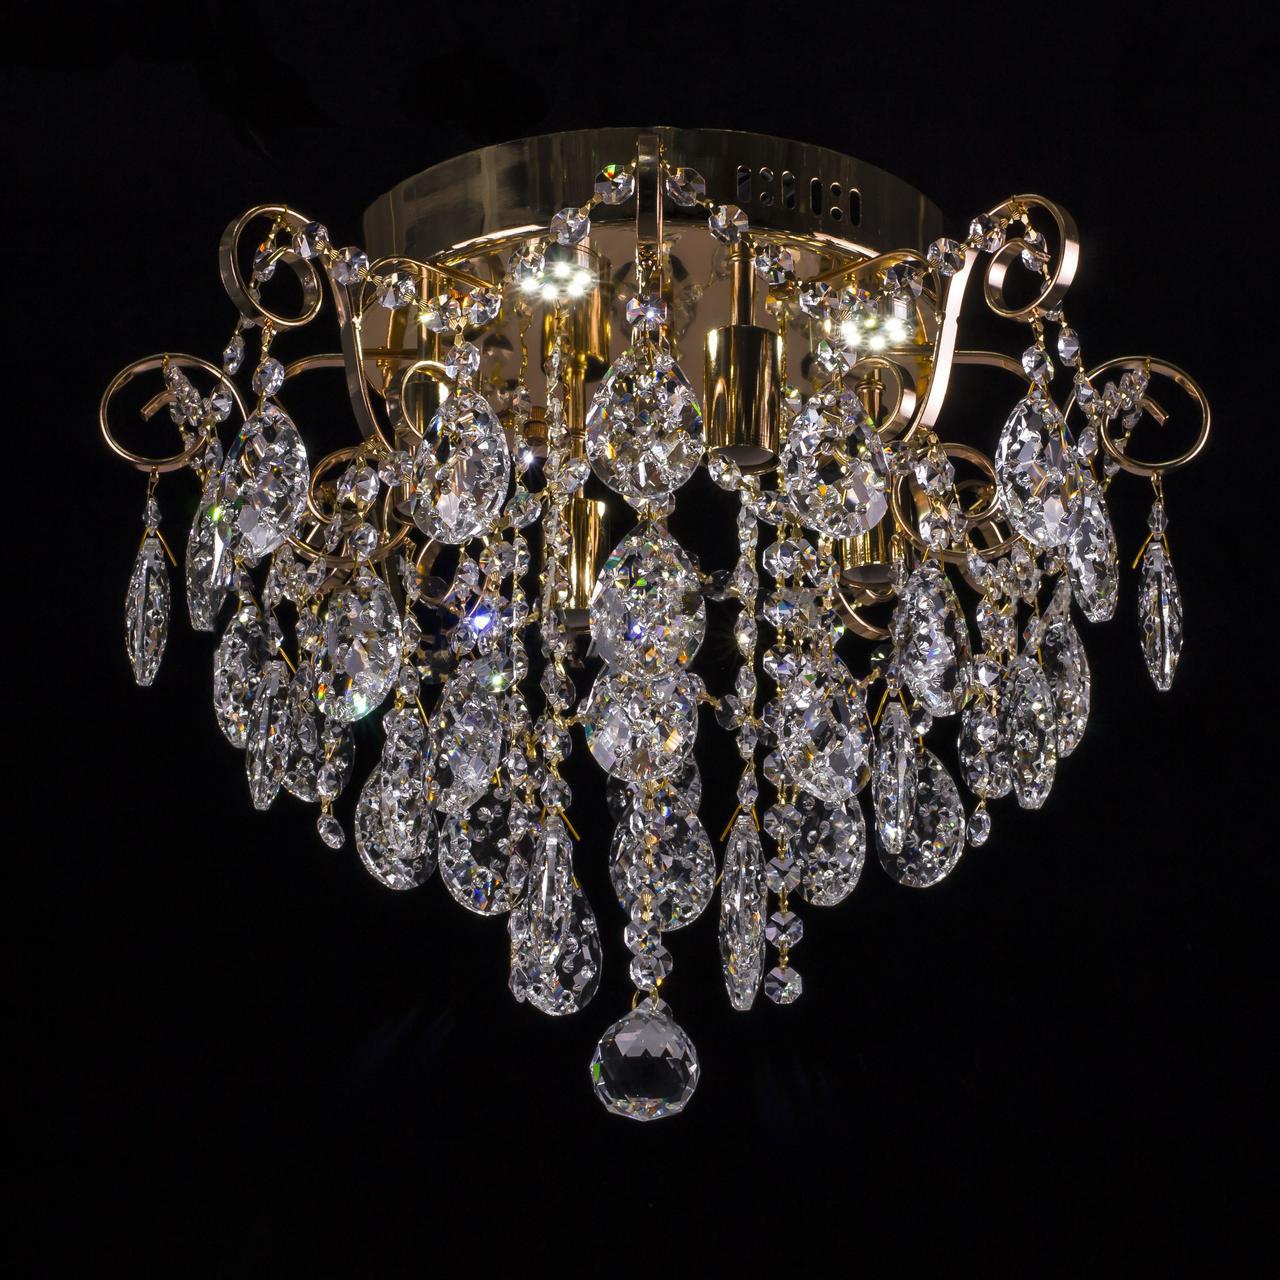 Хрустальная люстра, классическая с LED подсветкой на 4 лампочки. P5-E1136/4+4/FG